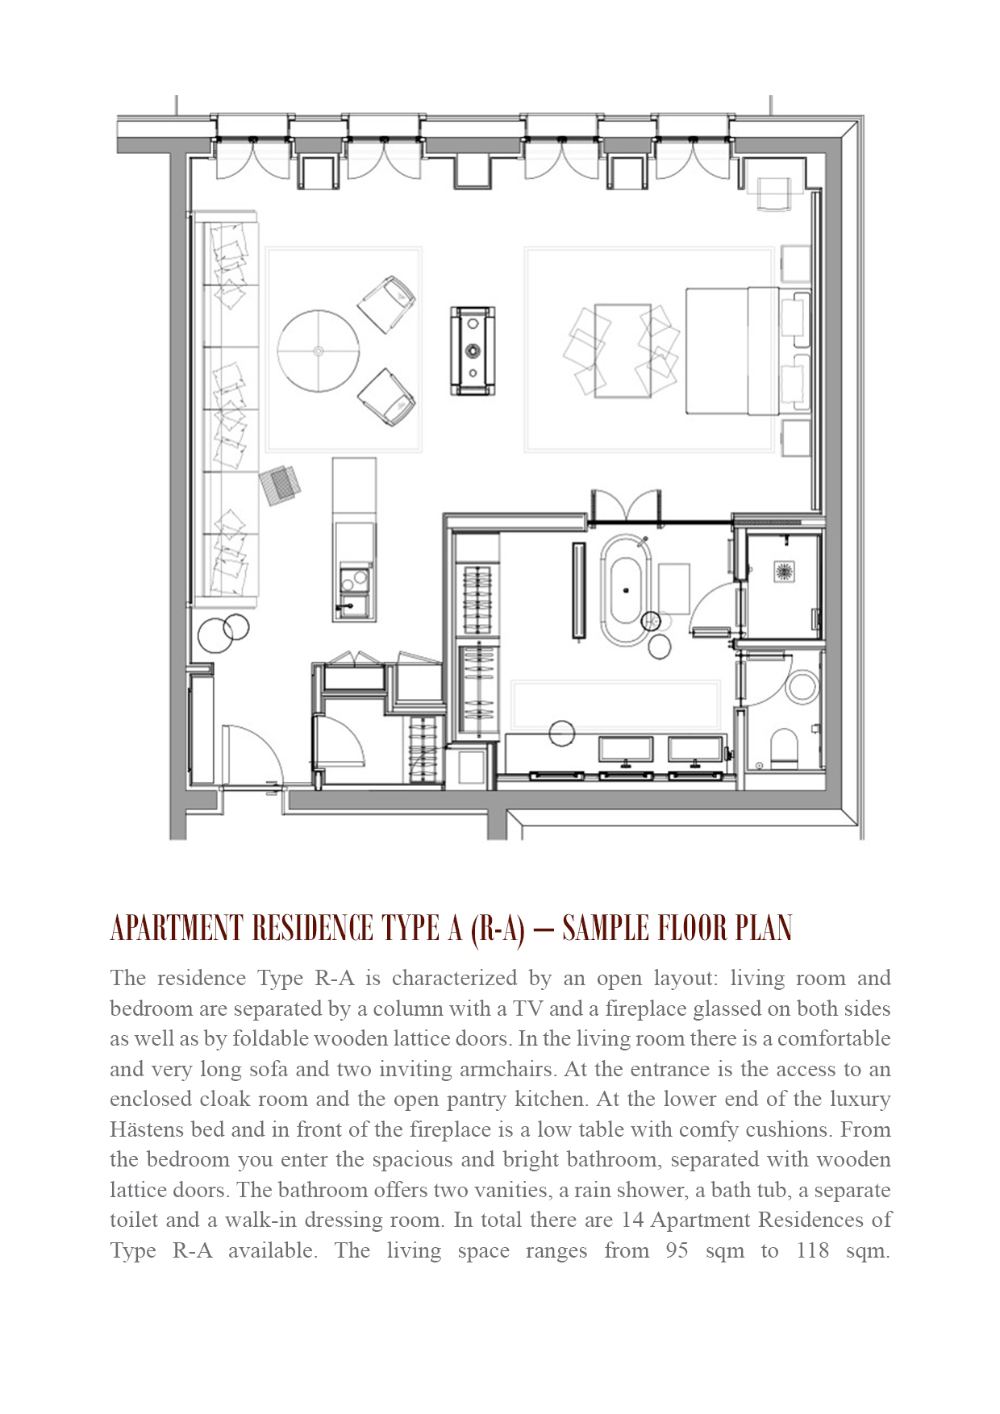 Chedi Andermatt Floorplans Chedi Andermatt Floor Plans Suma Luxury Realty In 2020 Floor Plans Apartment Floor Plans How To Plan